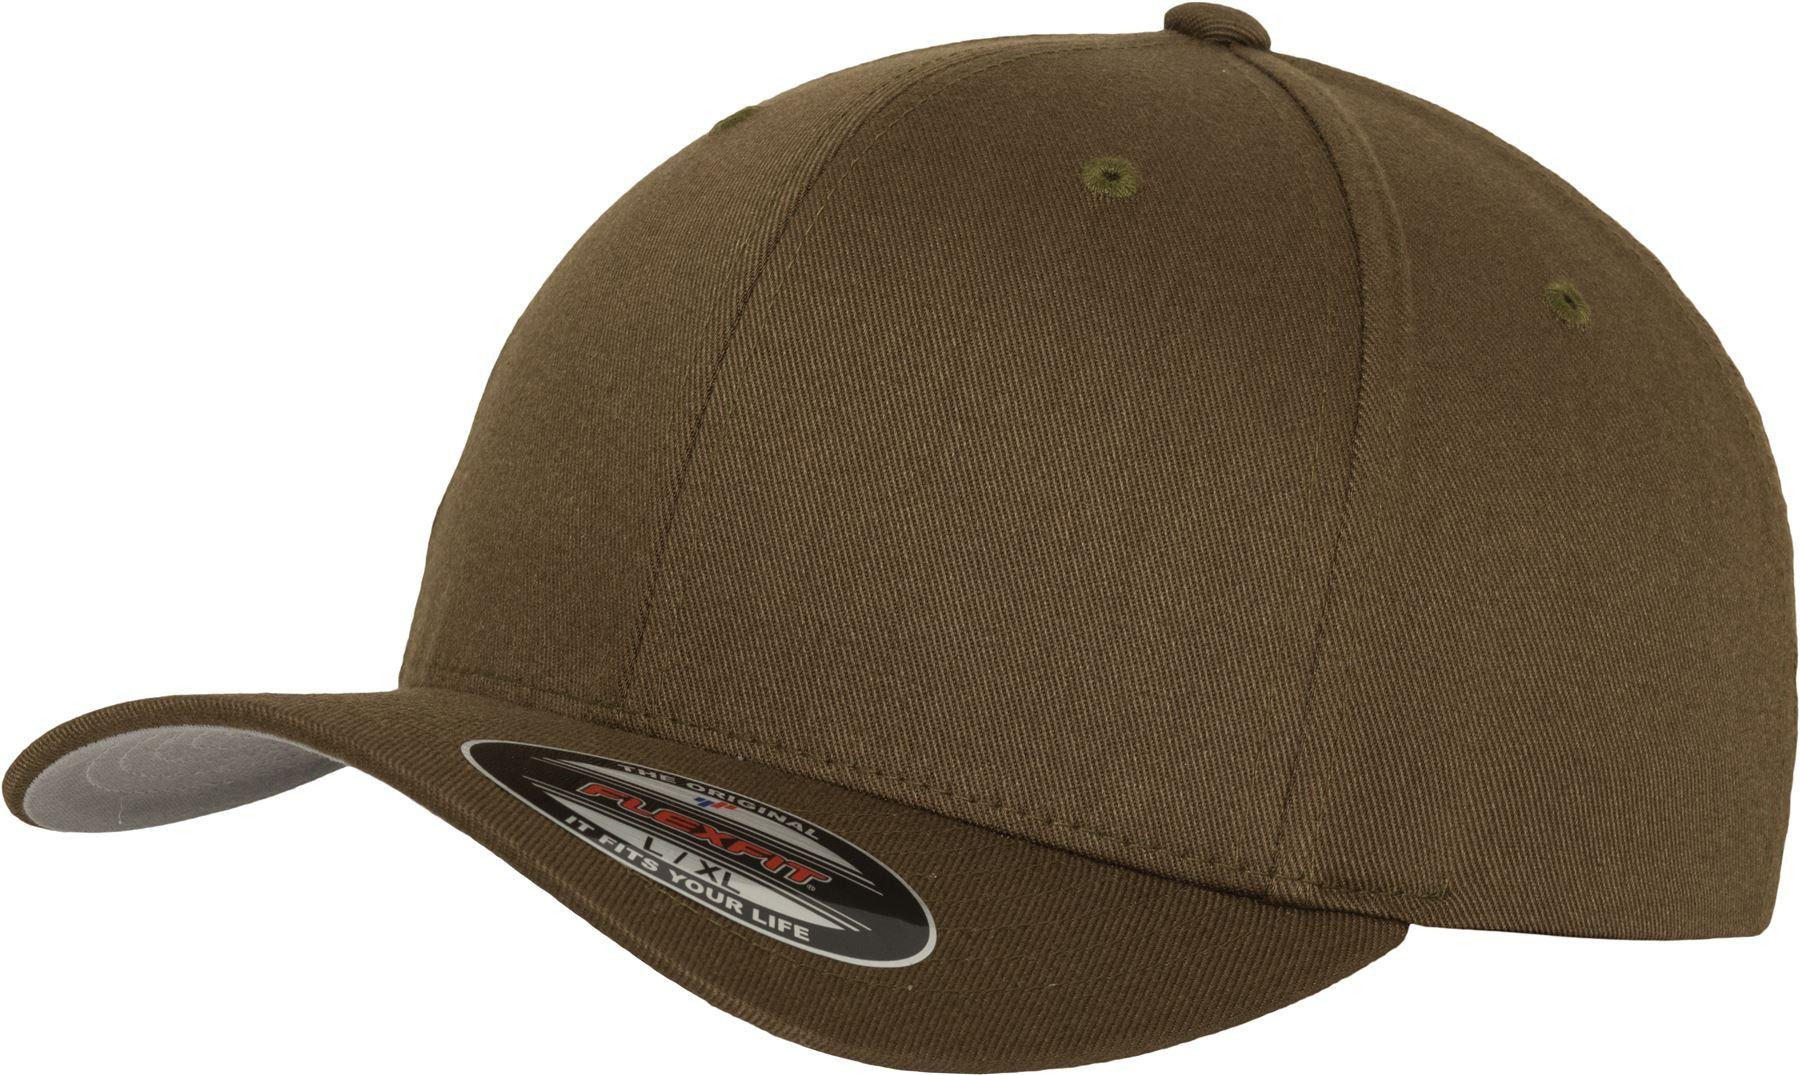 flexfit by yupoong headwear baseball caps flexfit fitted baseball cap. Black Bedroom Furniture Sets. Home Design Ideas